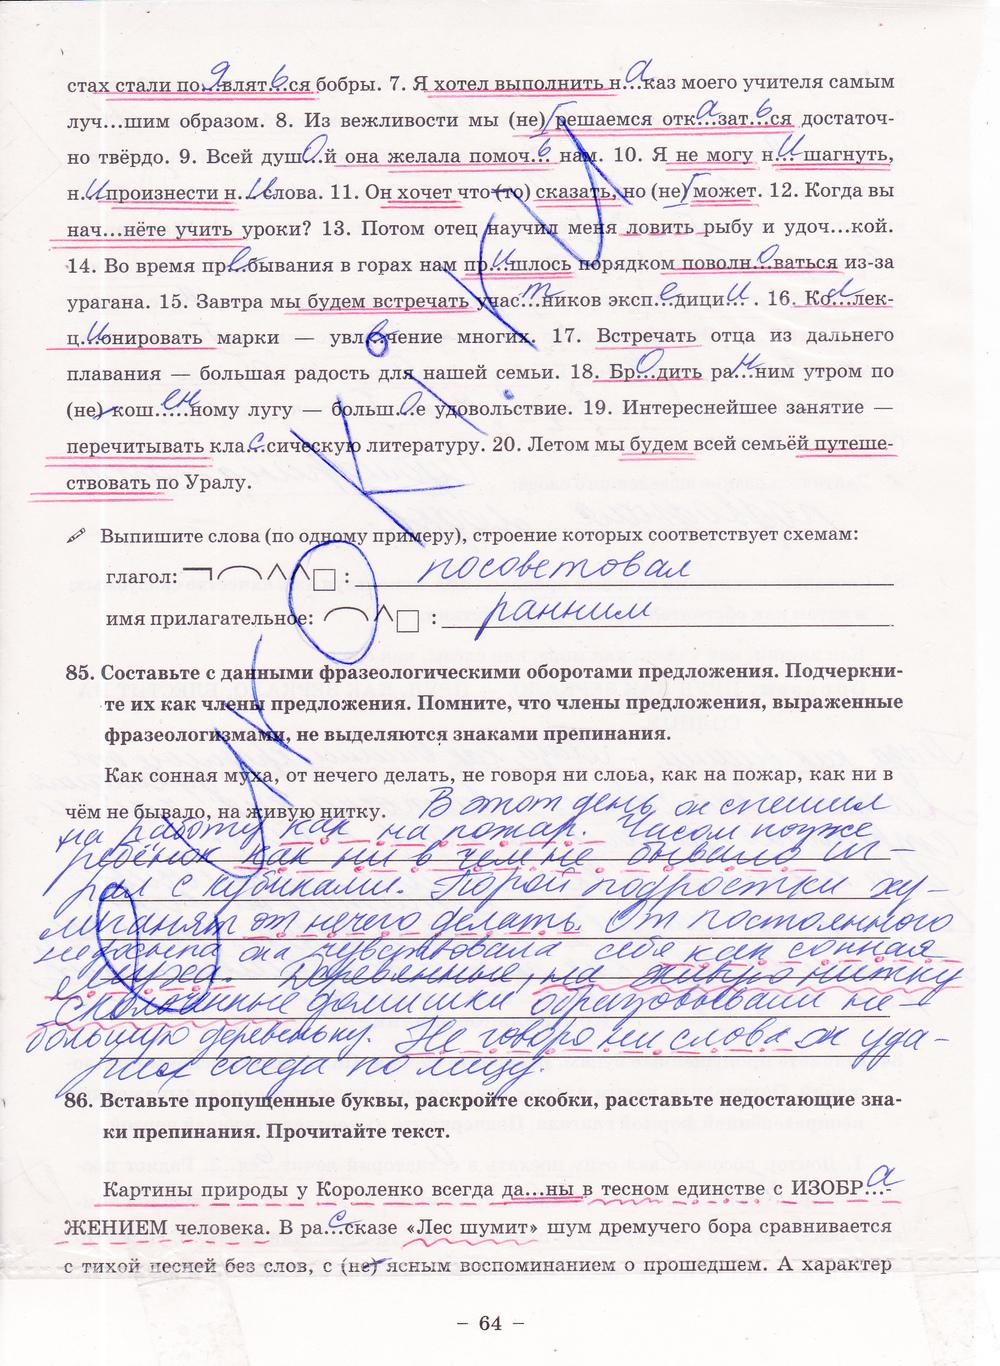 Гдз по русскому языку 8 класс рабочая тетрадь богданова